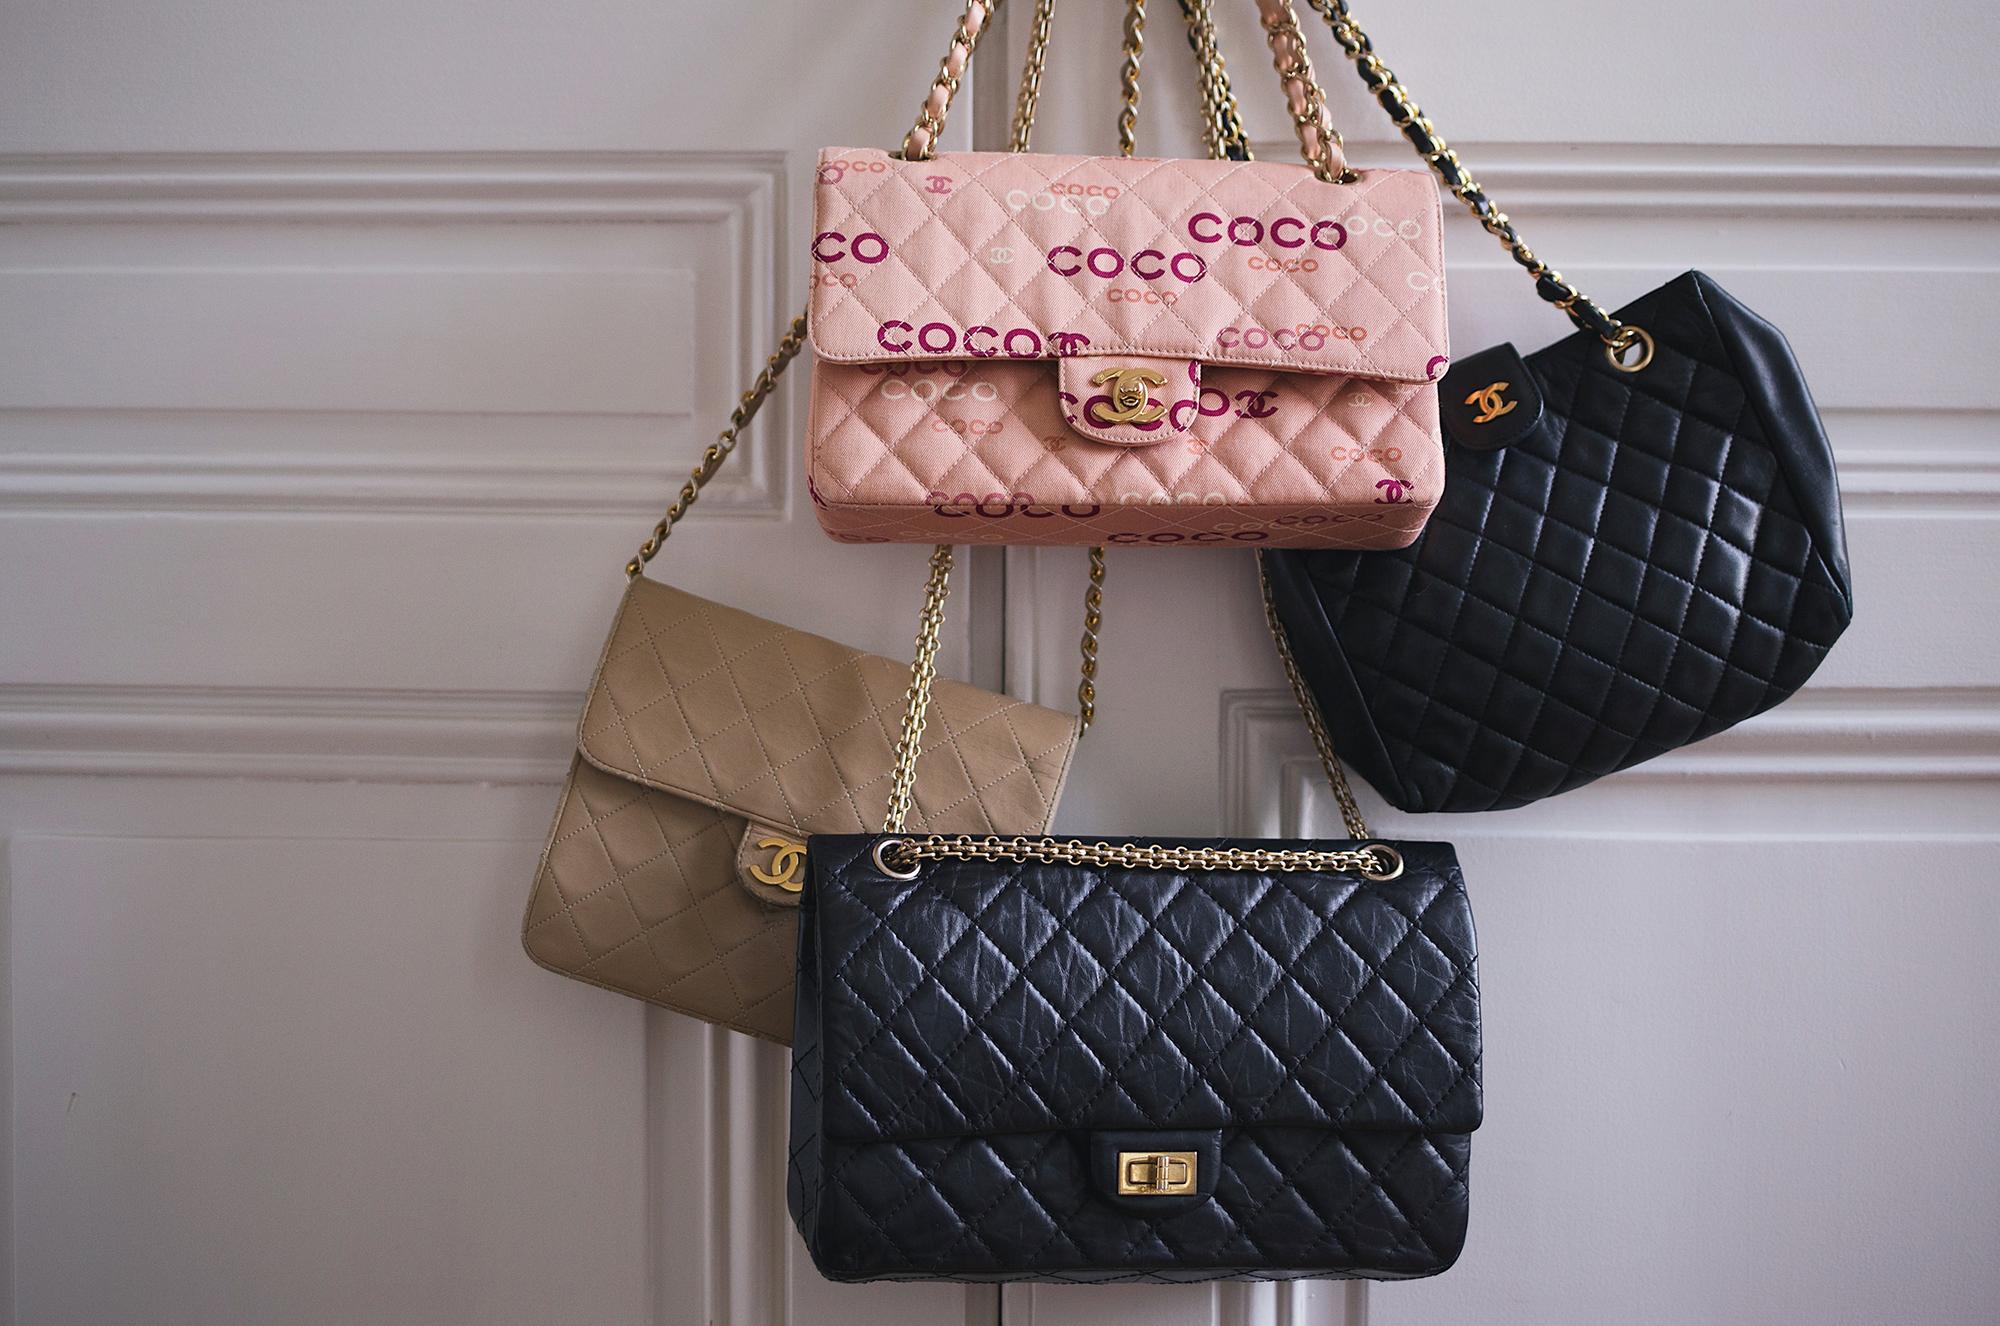 Investir dans un sac de luxe - Zoé Bassetto - blog mode - beauté ... 352d5a7b703